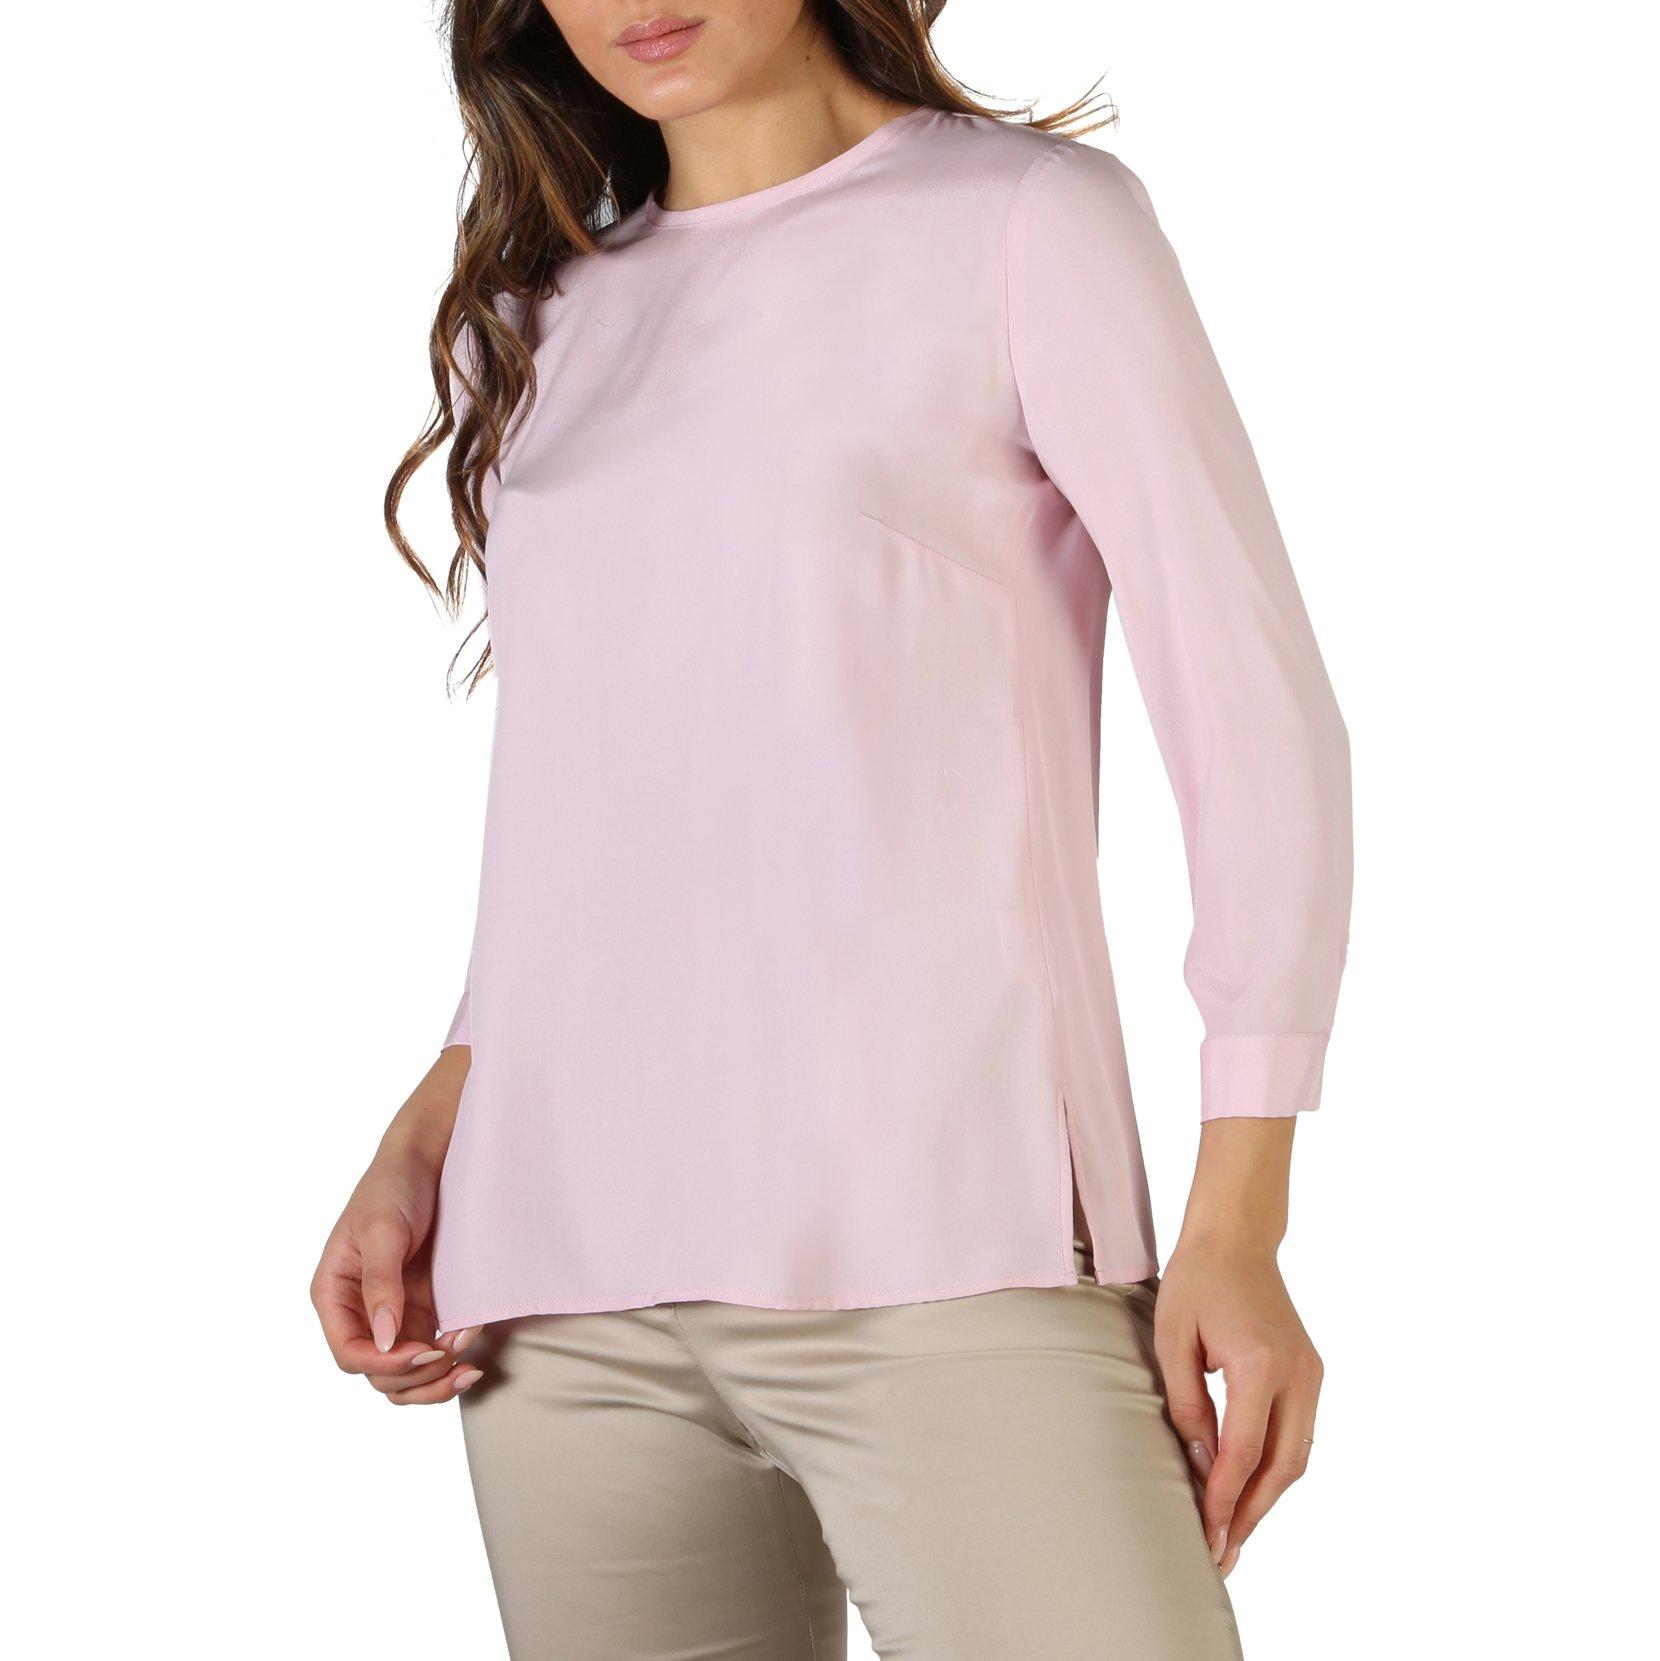 Fontana 2.0 Women's CHIARA Shirt Various Colours 325713 - pink 40